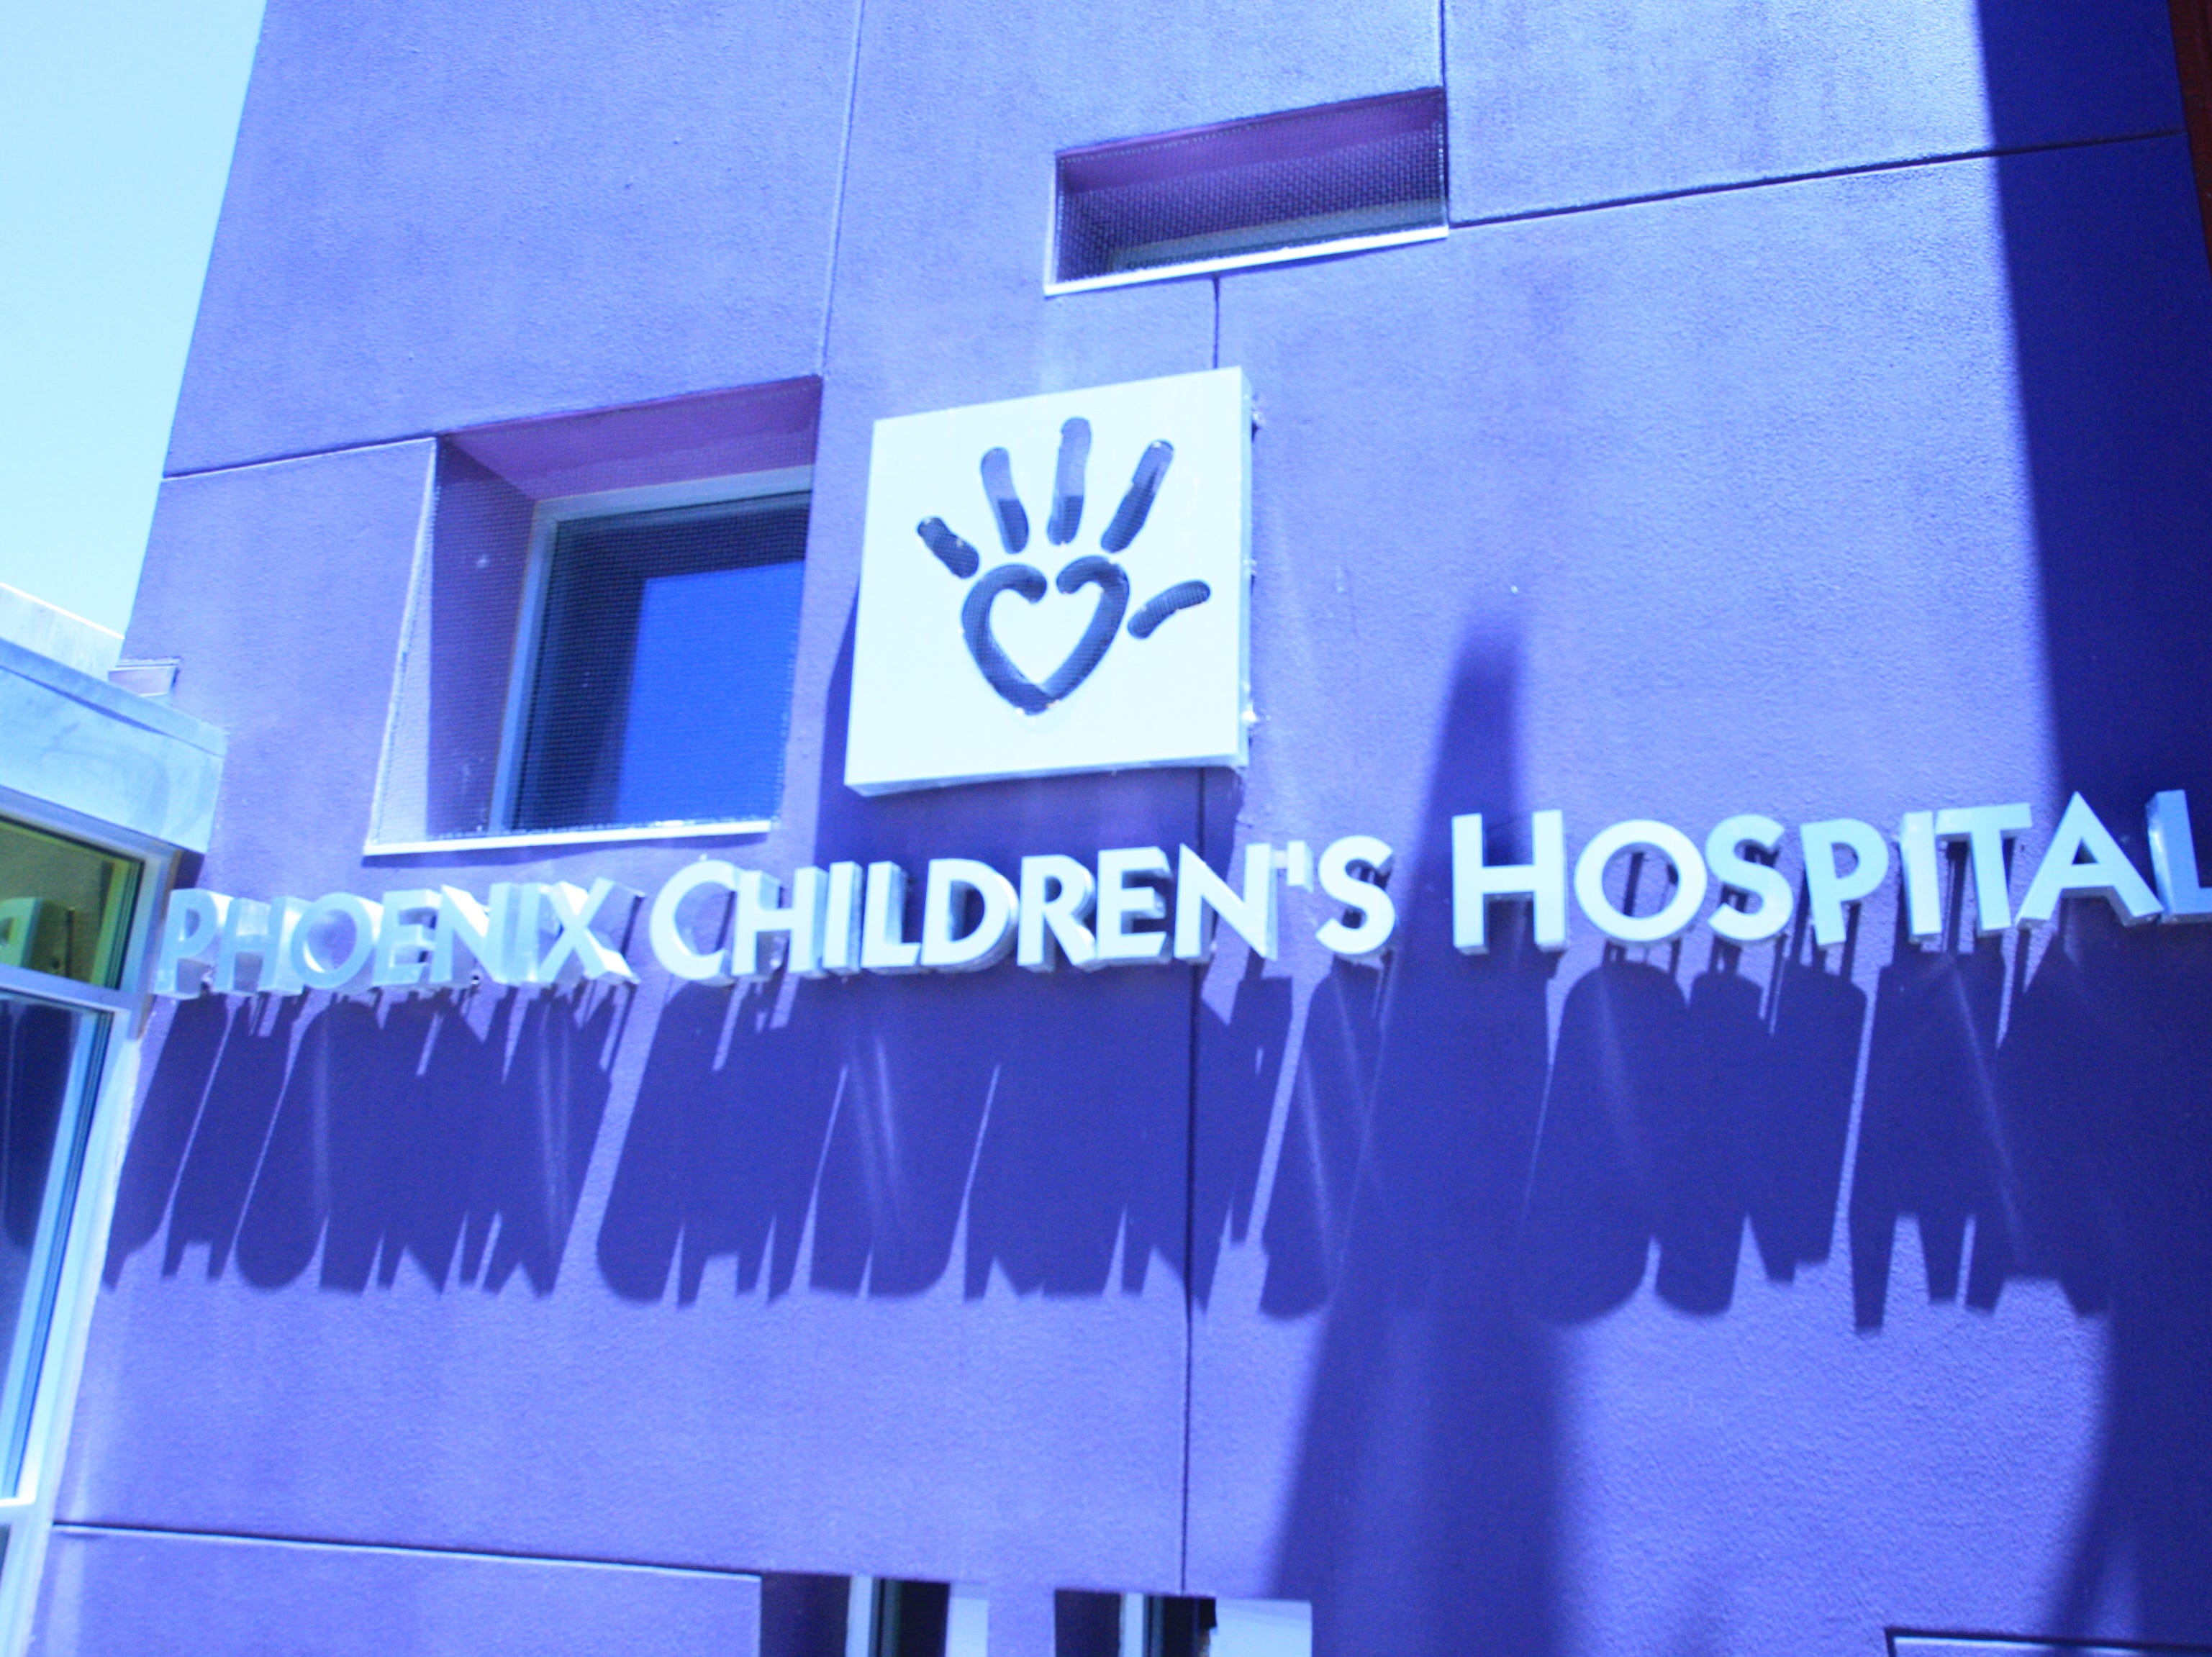 No. 32: Phoenix Children's Hospital | Pediatric-focused medical services | 2019 employees: 4,900 | 2018 employees: 4,896 | Ownership: Non-profit | Headquarters: Phoenix | www.phoenixchildrens.org